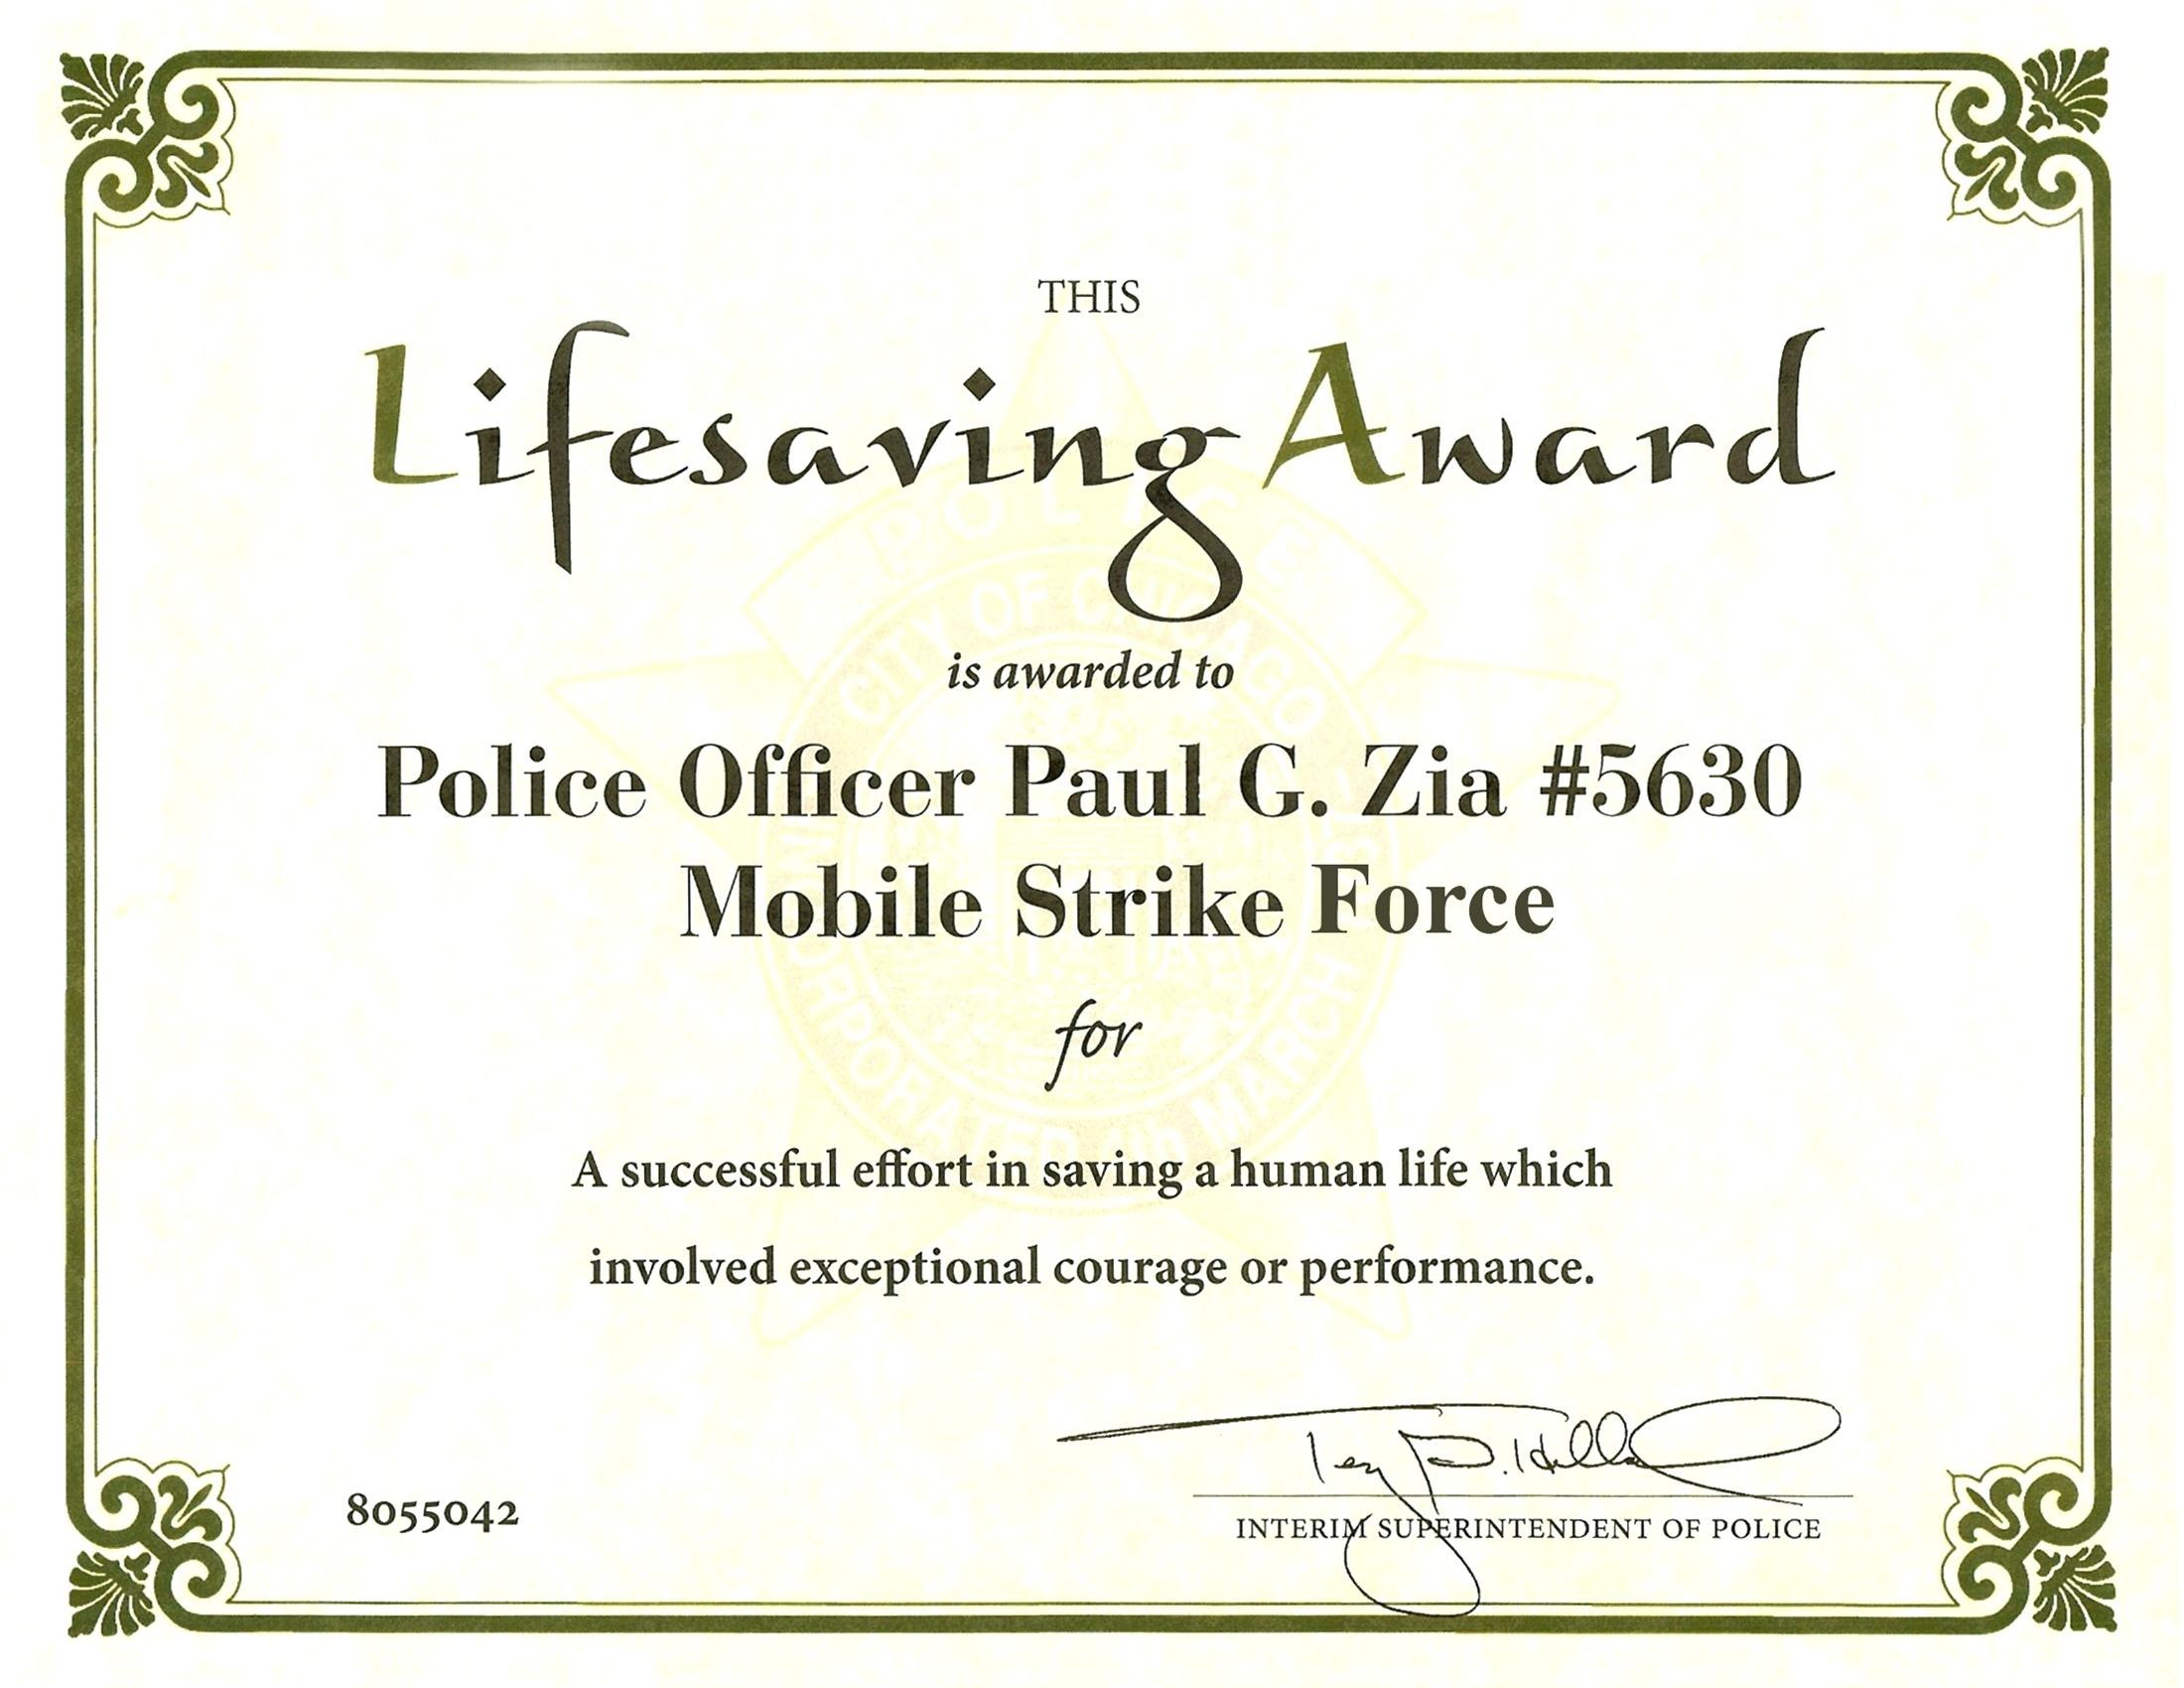 Certificate Of Performance Template  – Elsik Blue Cetane For Life Saving Award Certificate Template